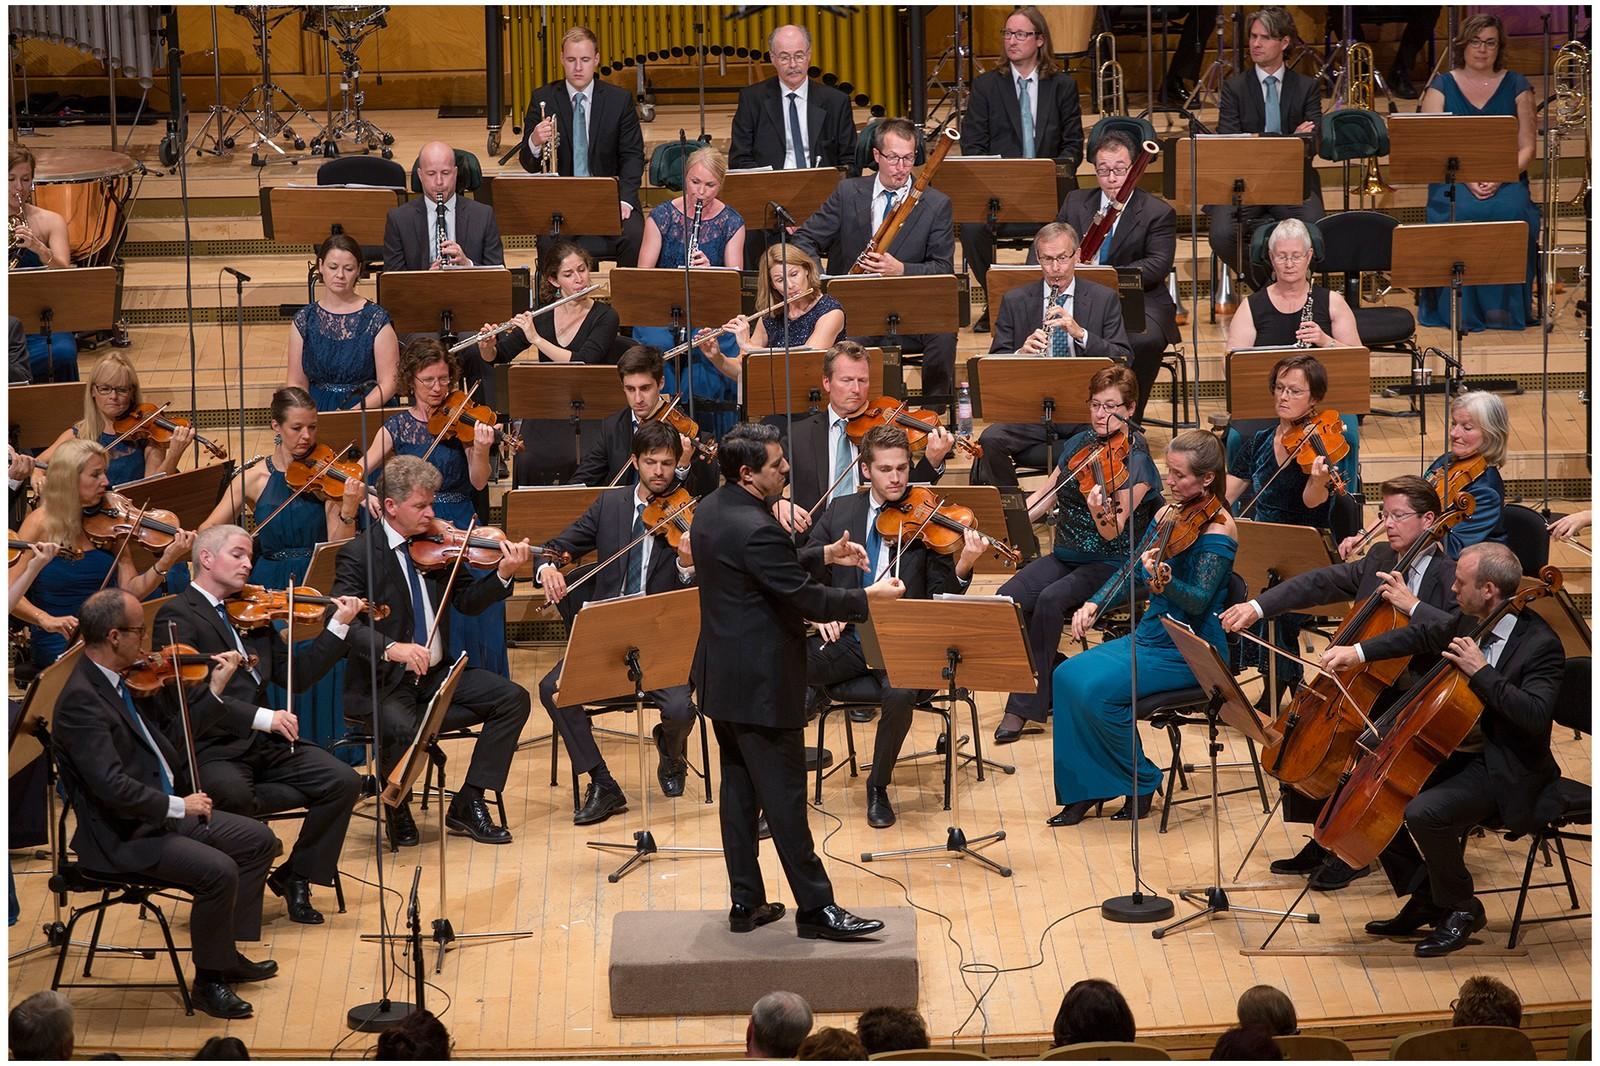 Kringkastingsorkestret på RadiRo i Bucuresti 2016. Dirigent: Miguel Harth-Bedoya